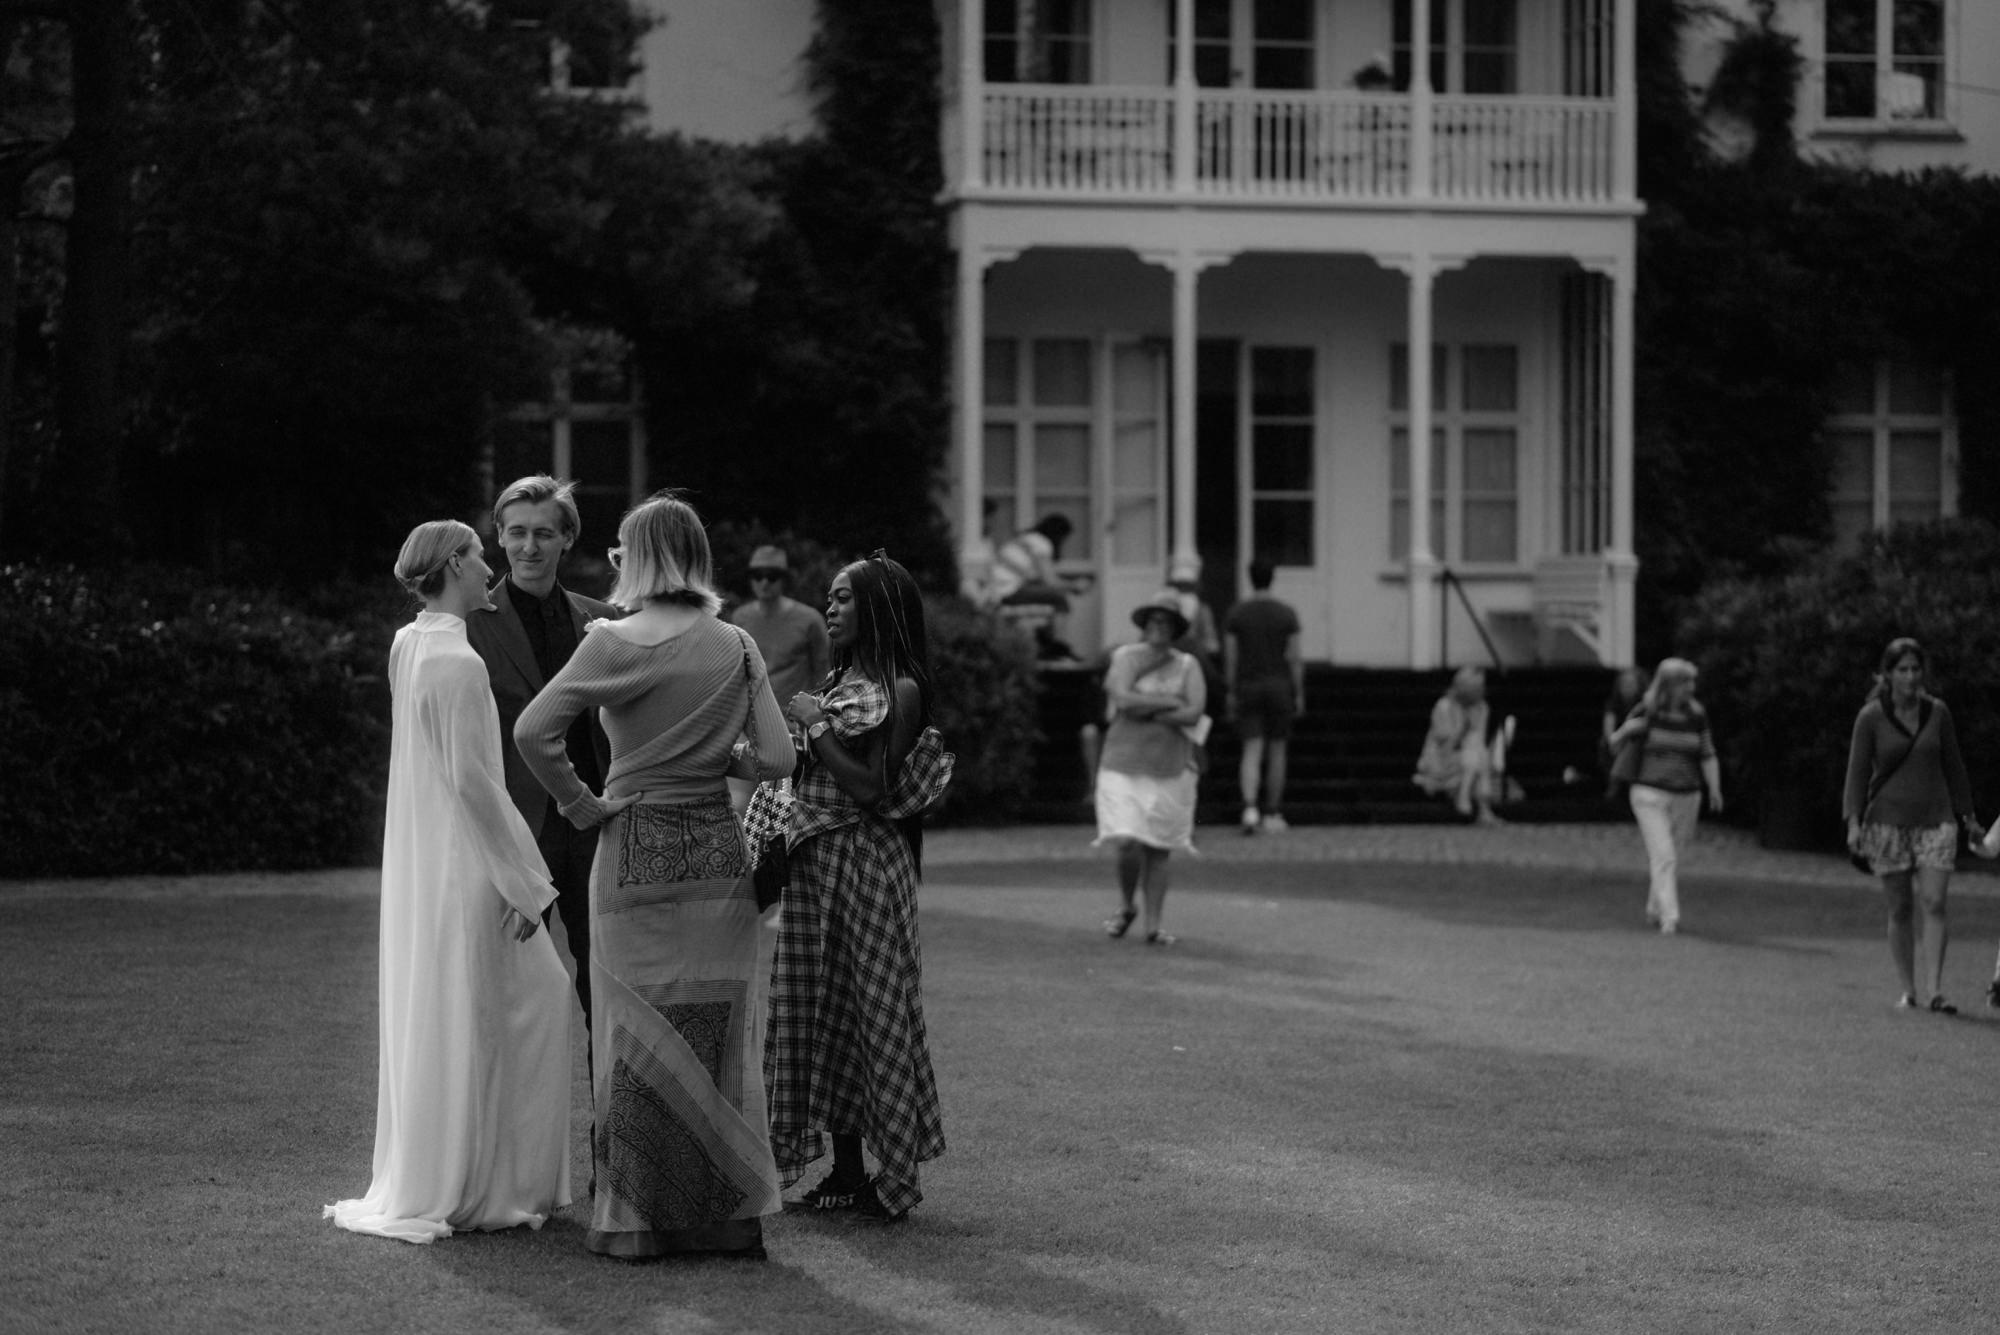 copenhagen wedding photography 0039 1